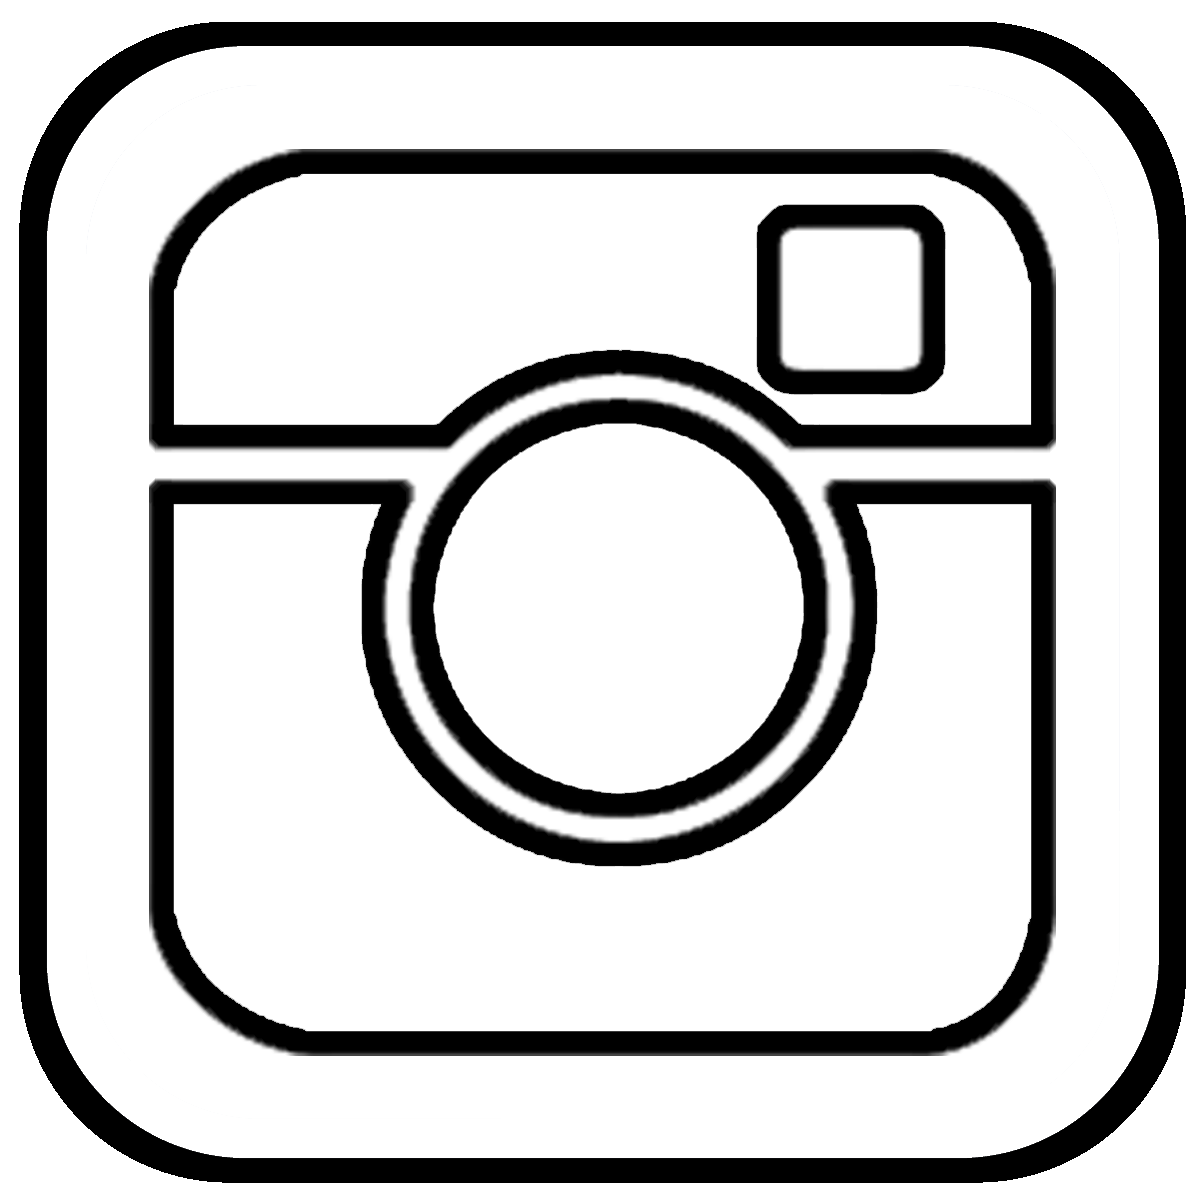 instagram-logo-transparent-BmH2pV-clipart - Supportive Guru